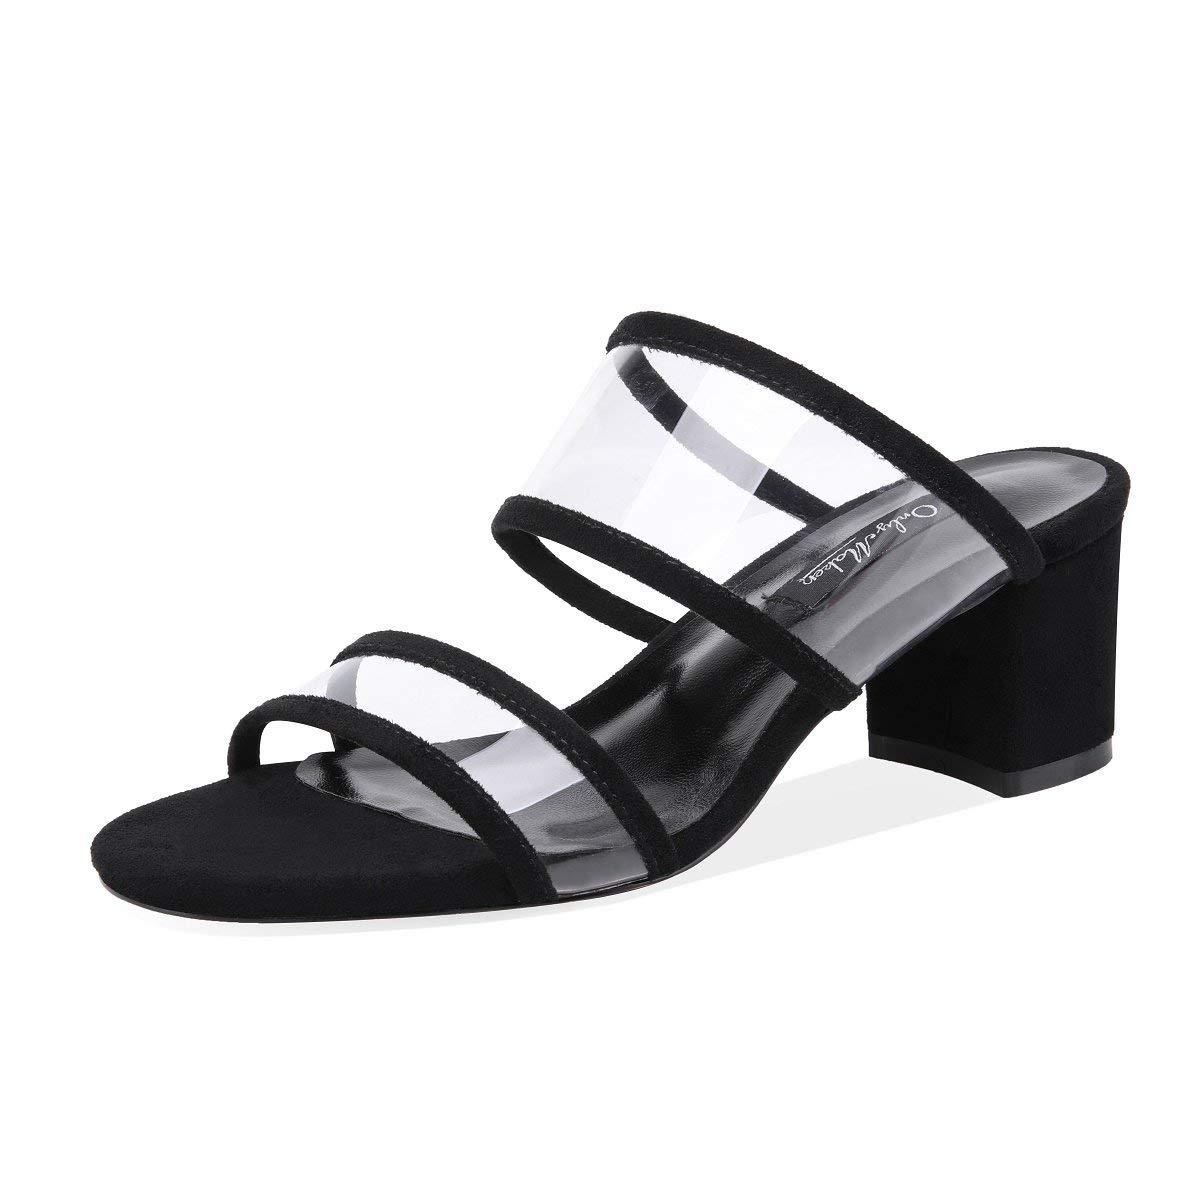 c5a38d1ab Get Quotations · onlymaker Womens PVC Clear Double Straps Block Heel Slide  Sandals Open Toe Slip on Mule Dress